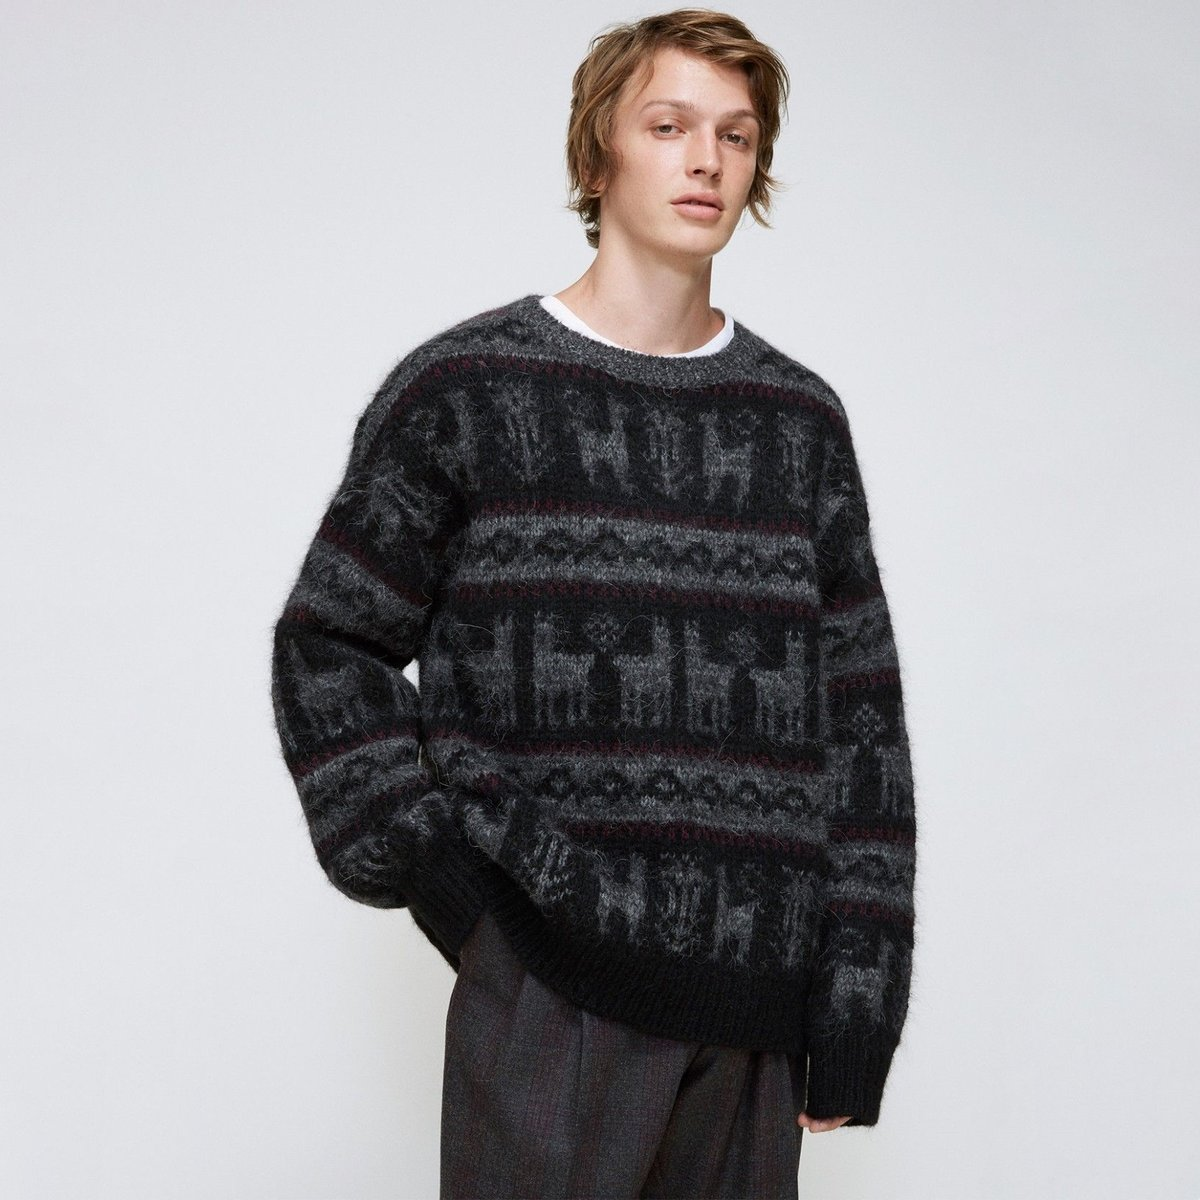 Dries Van Noten Tardos Sweater 1.jpg